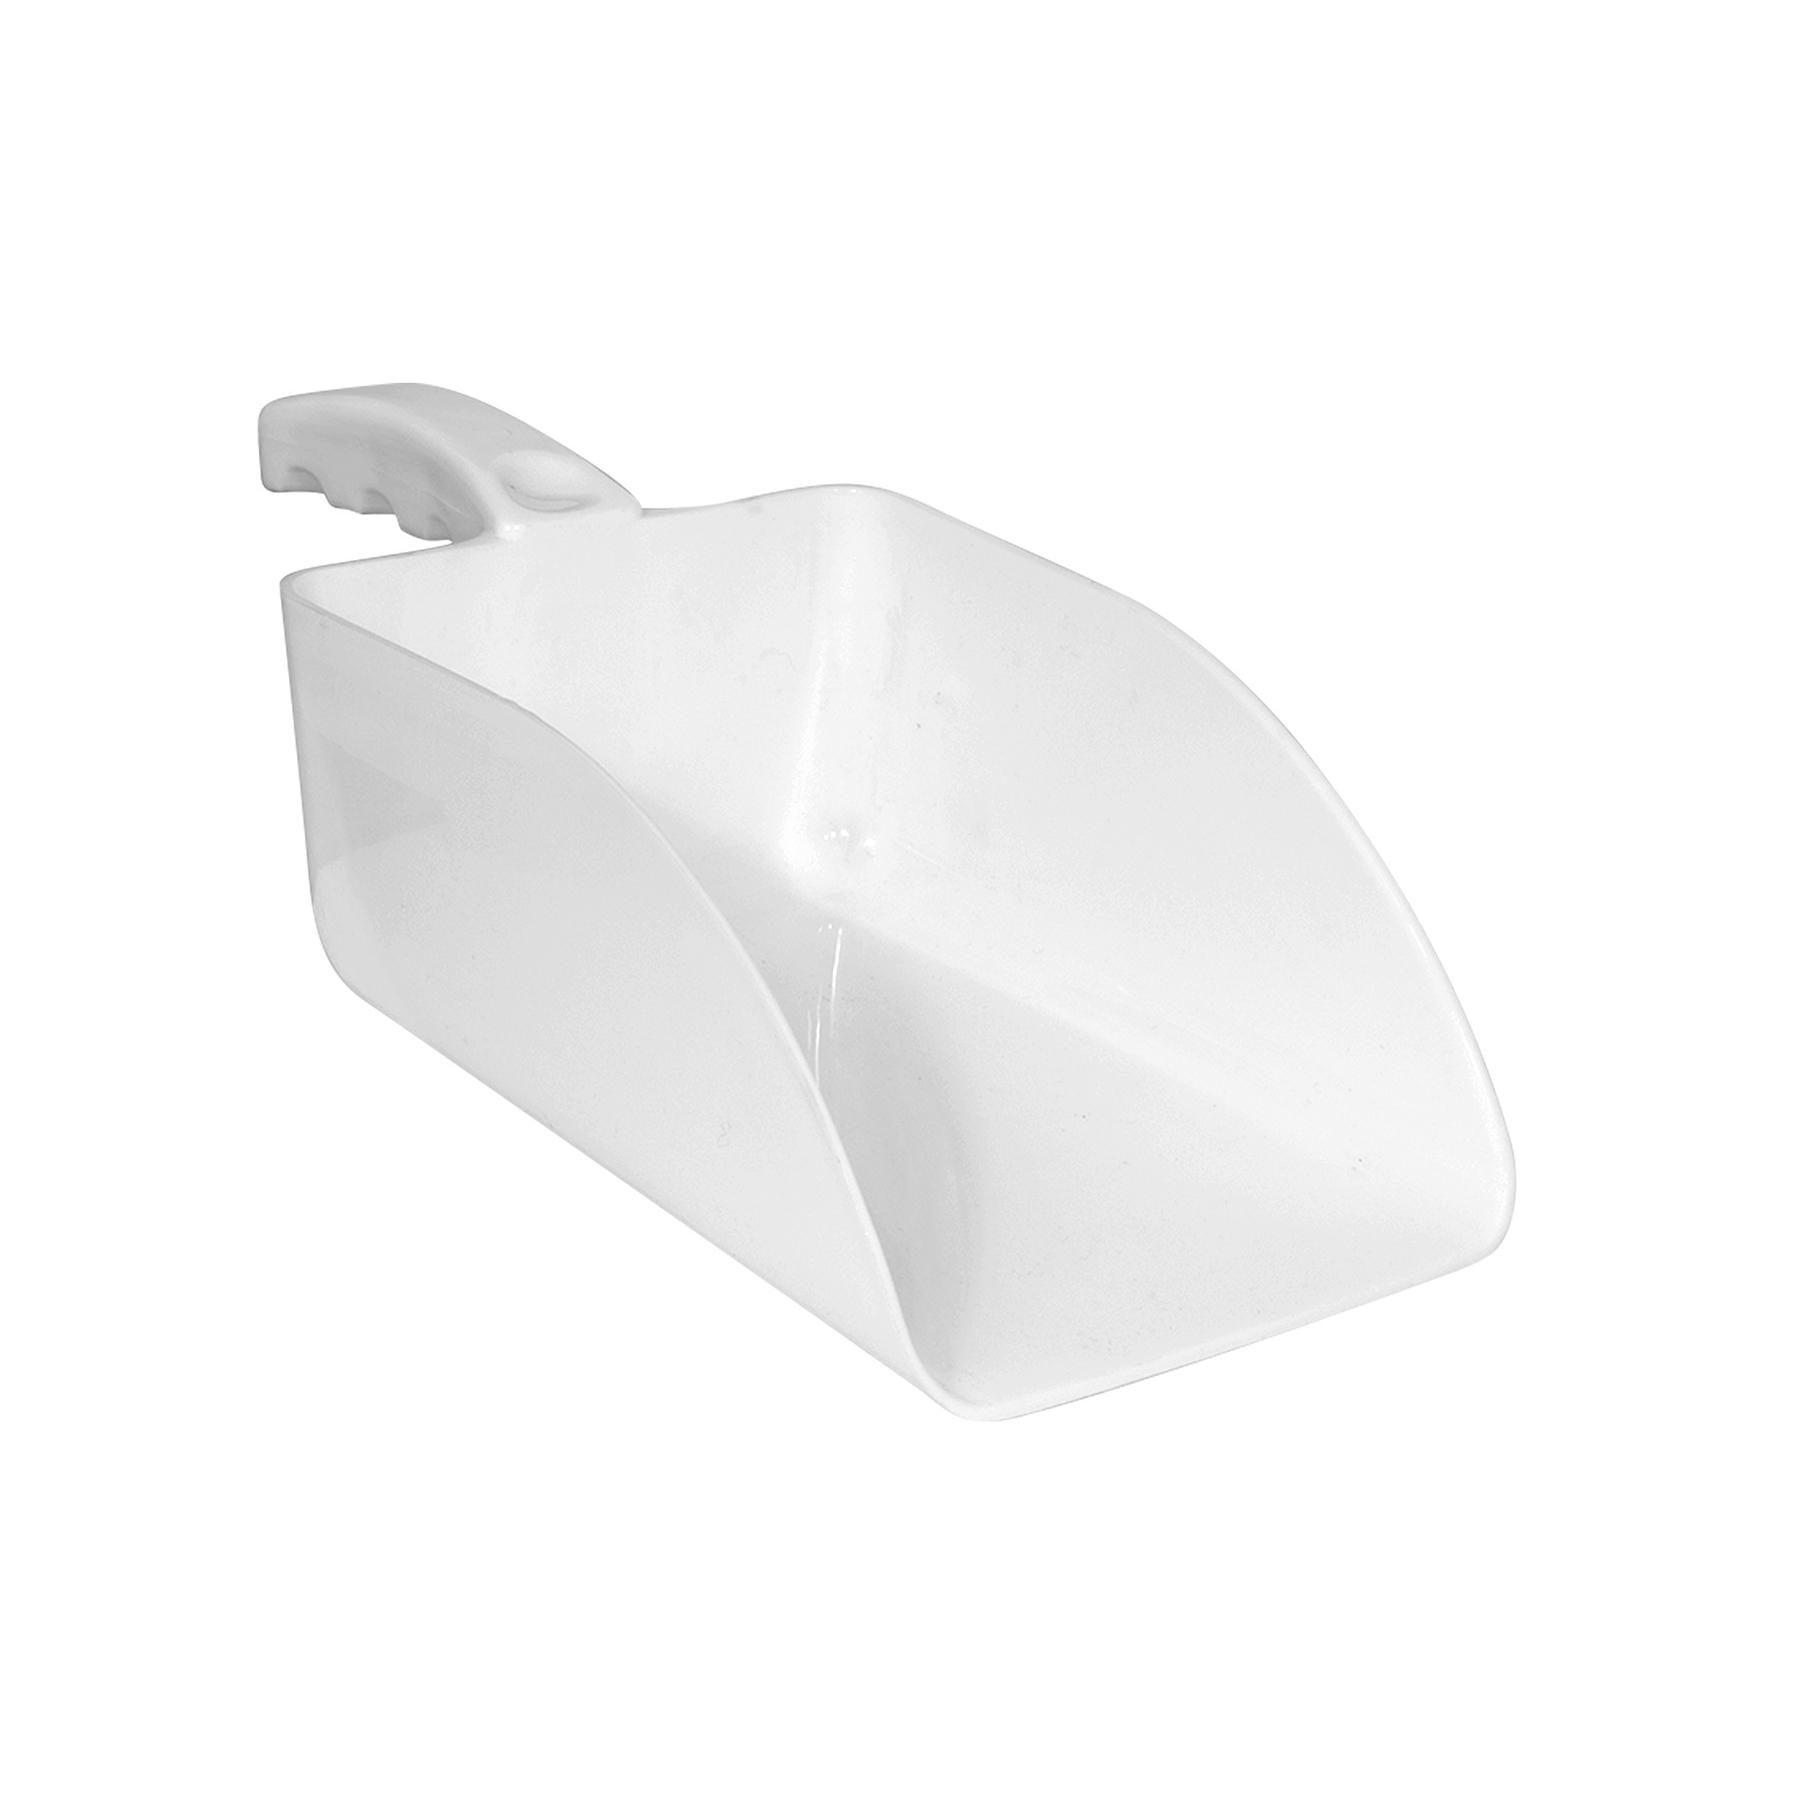 Charles Bentley Plastic Scoop General Purpose Small Ref SPC/SCOOP.01